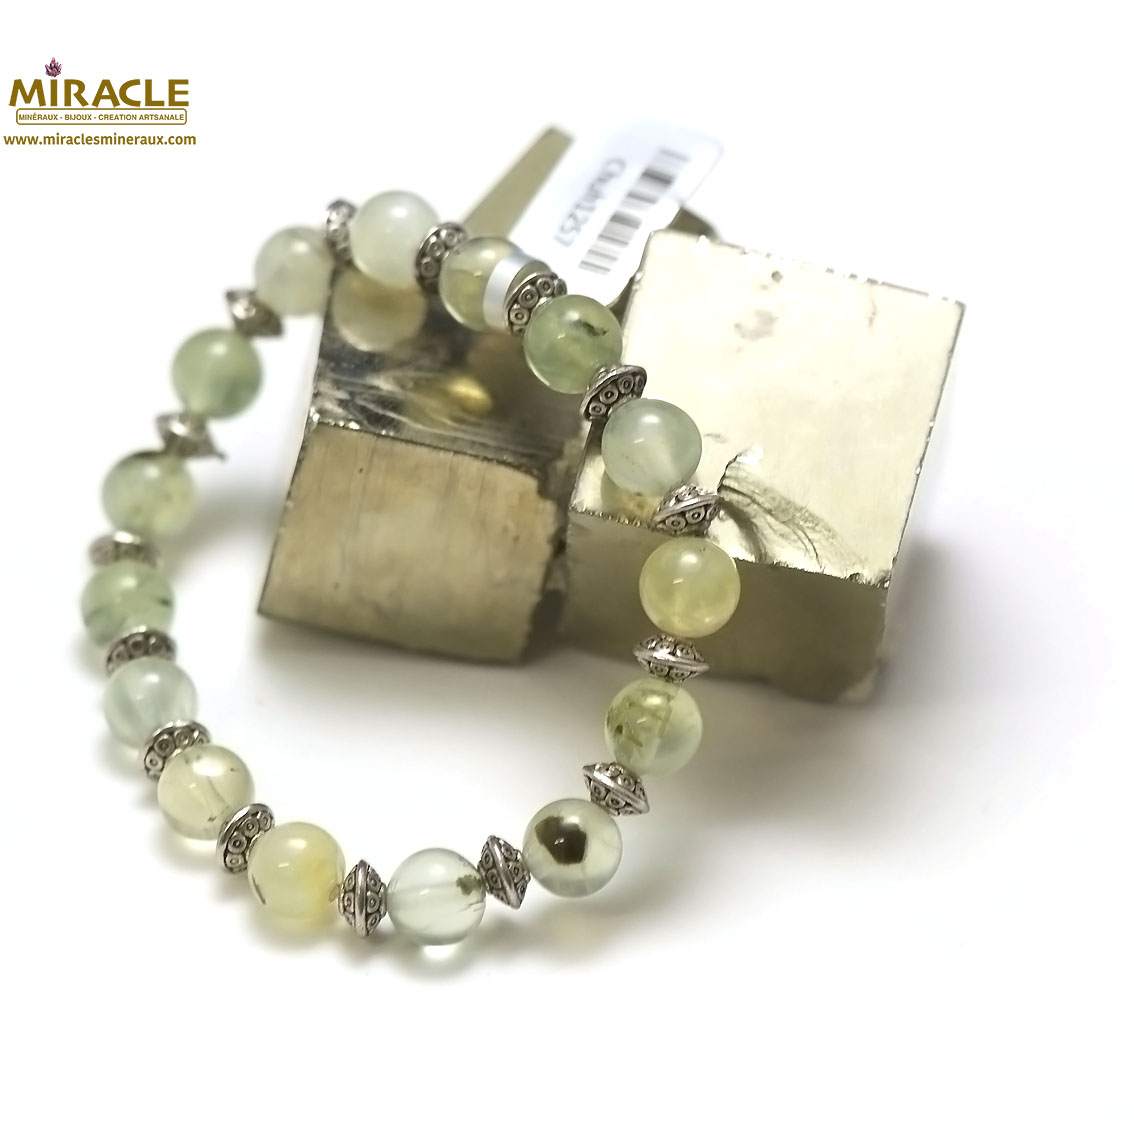 Bracelet préhnite, perleronde 8 mm-perle argent